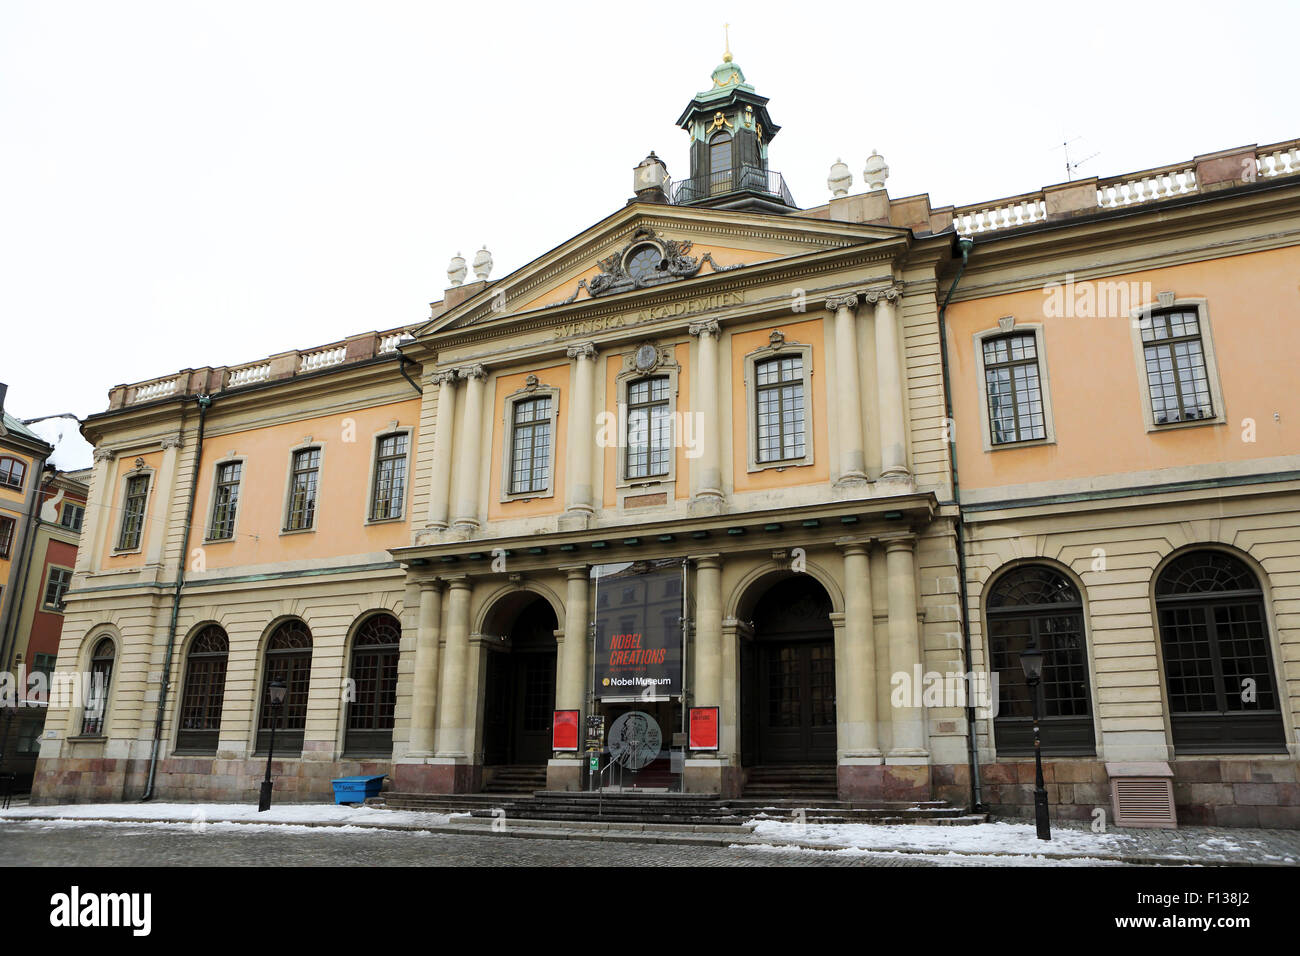 The Swedish Academy (Svenska Akademien) in Stockholm, Sweden. The Nobel Prize is awarded in the building. - Stock Image